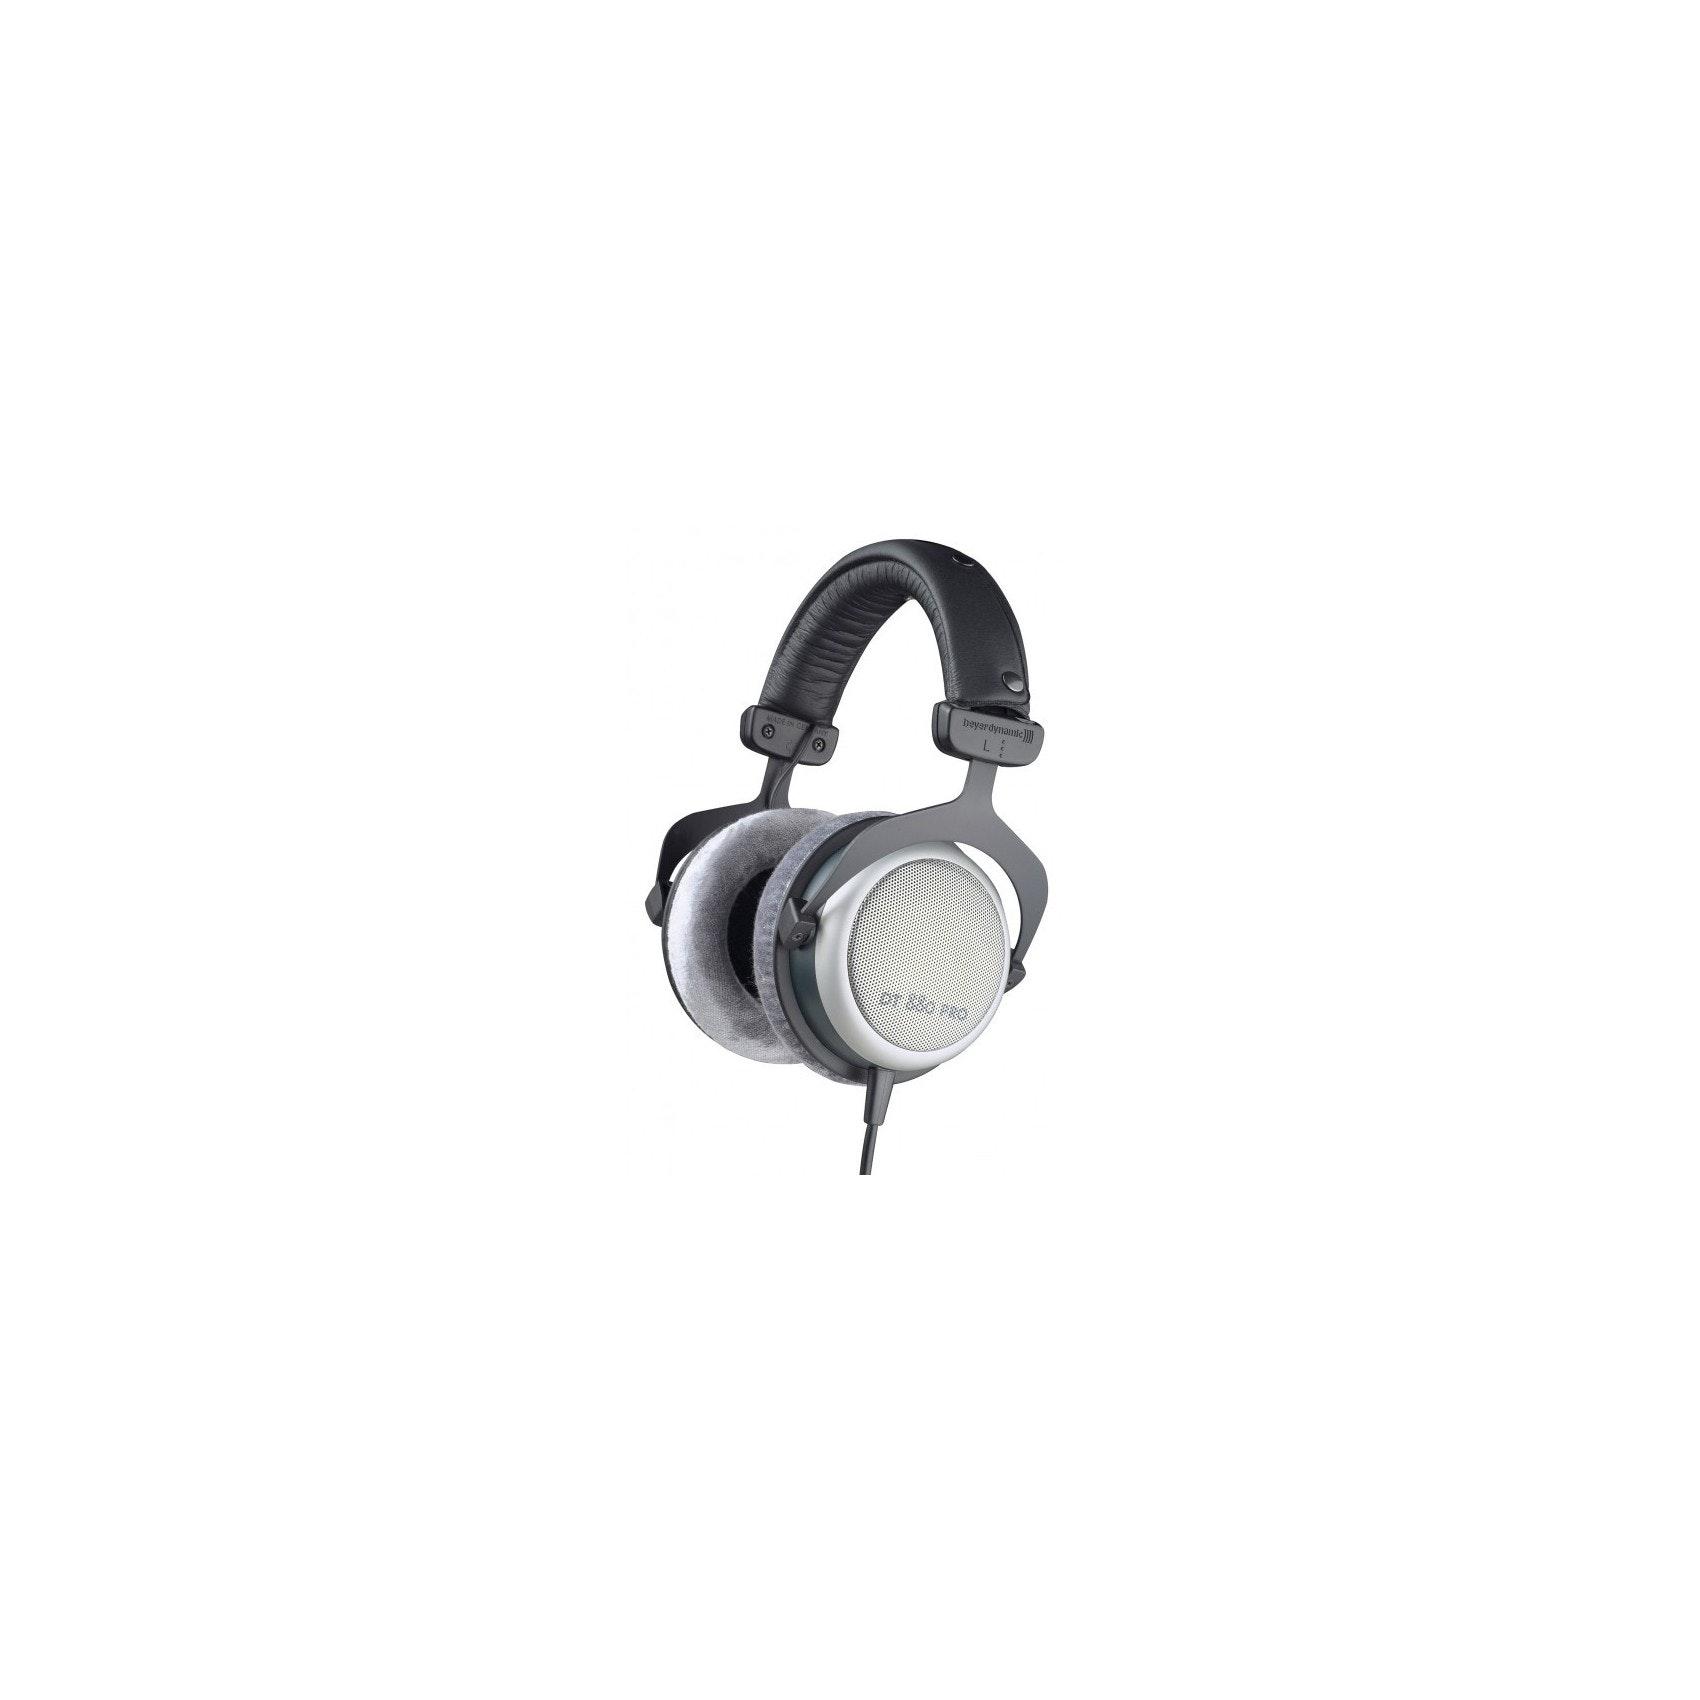 beyerdynamic DT 880 PRO: Semi-open studio reference headphone